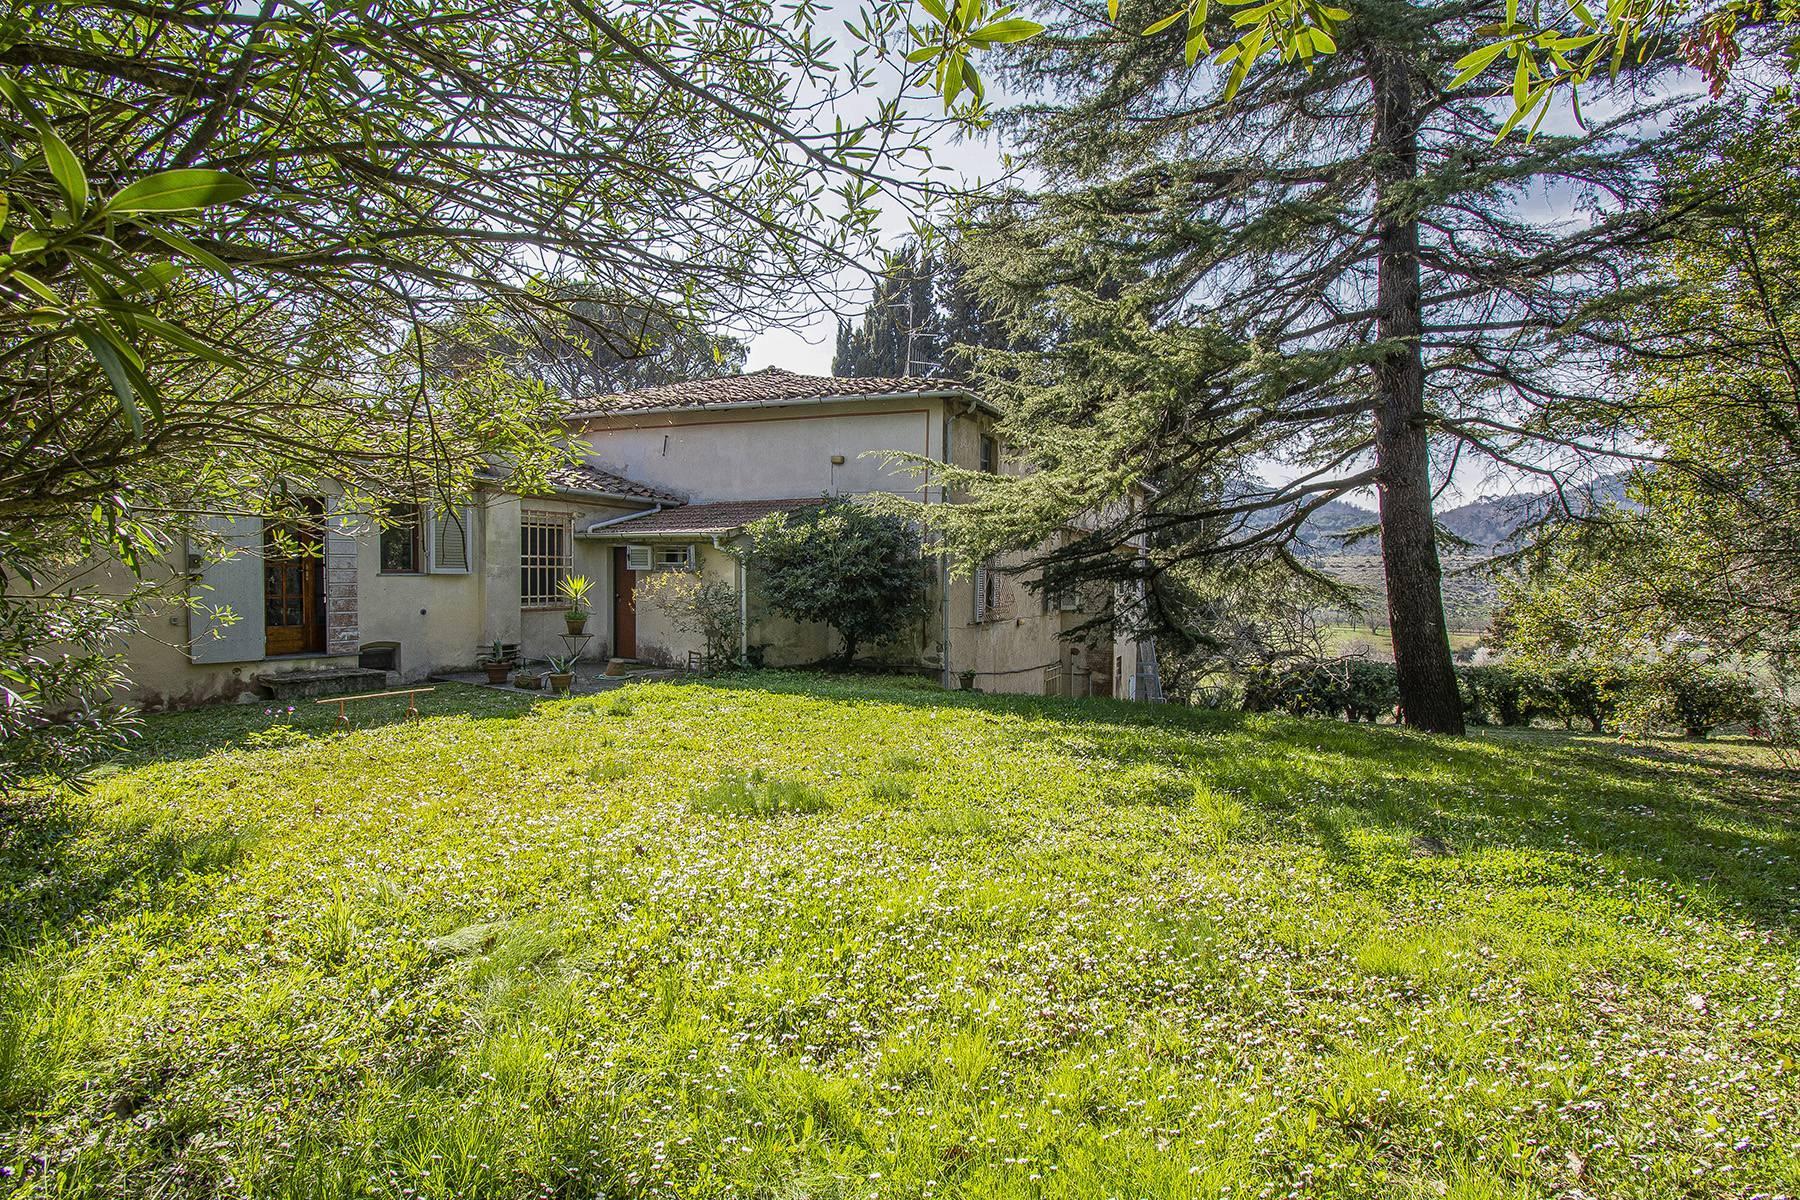 Romantic villa on the hills between Pisa and Lucca - 26